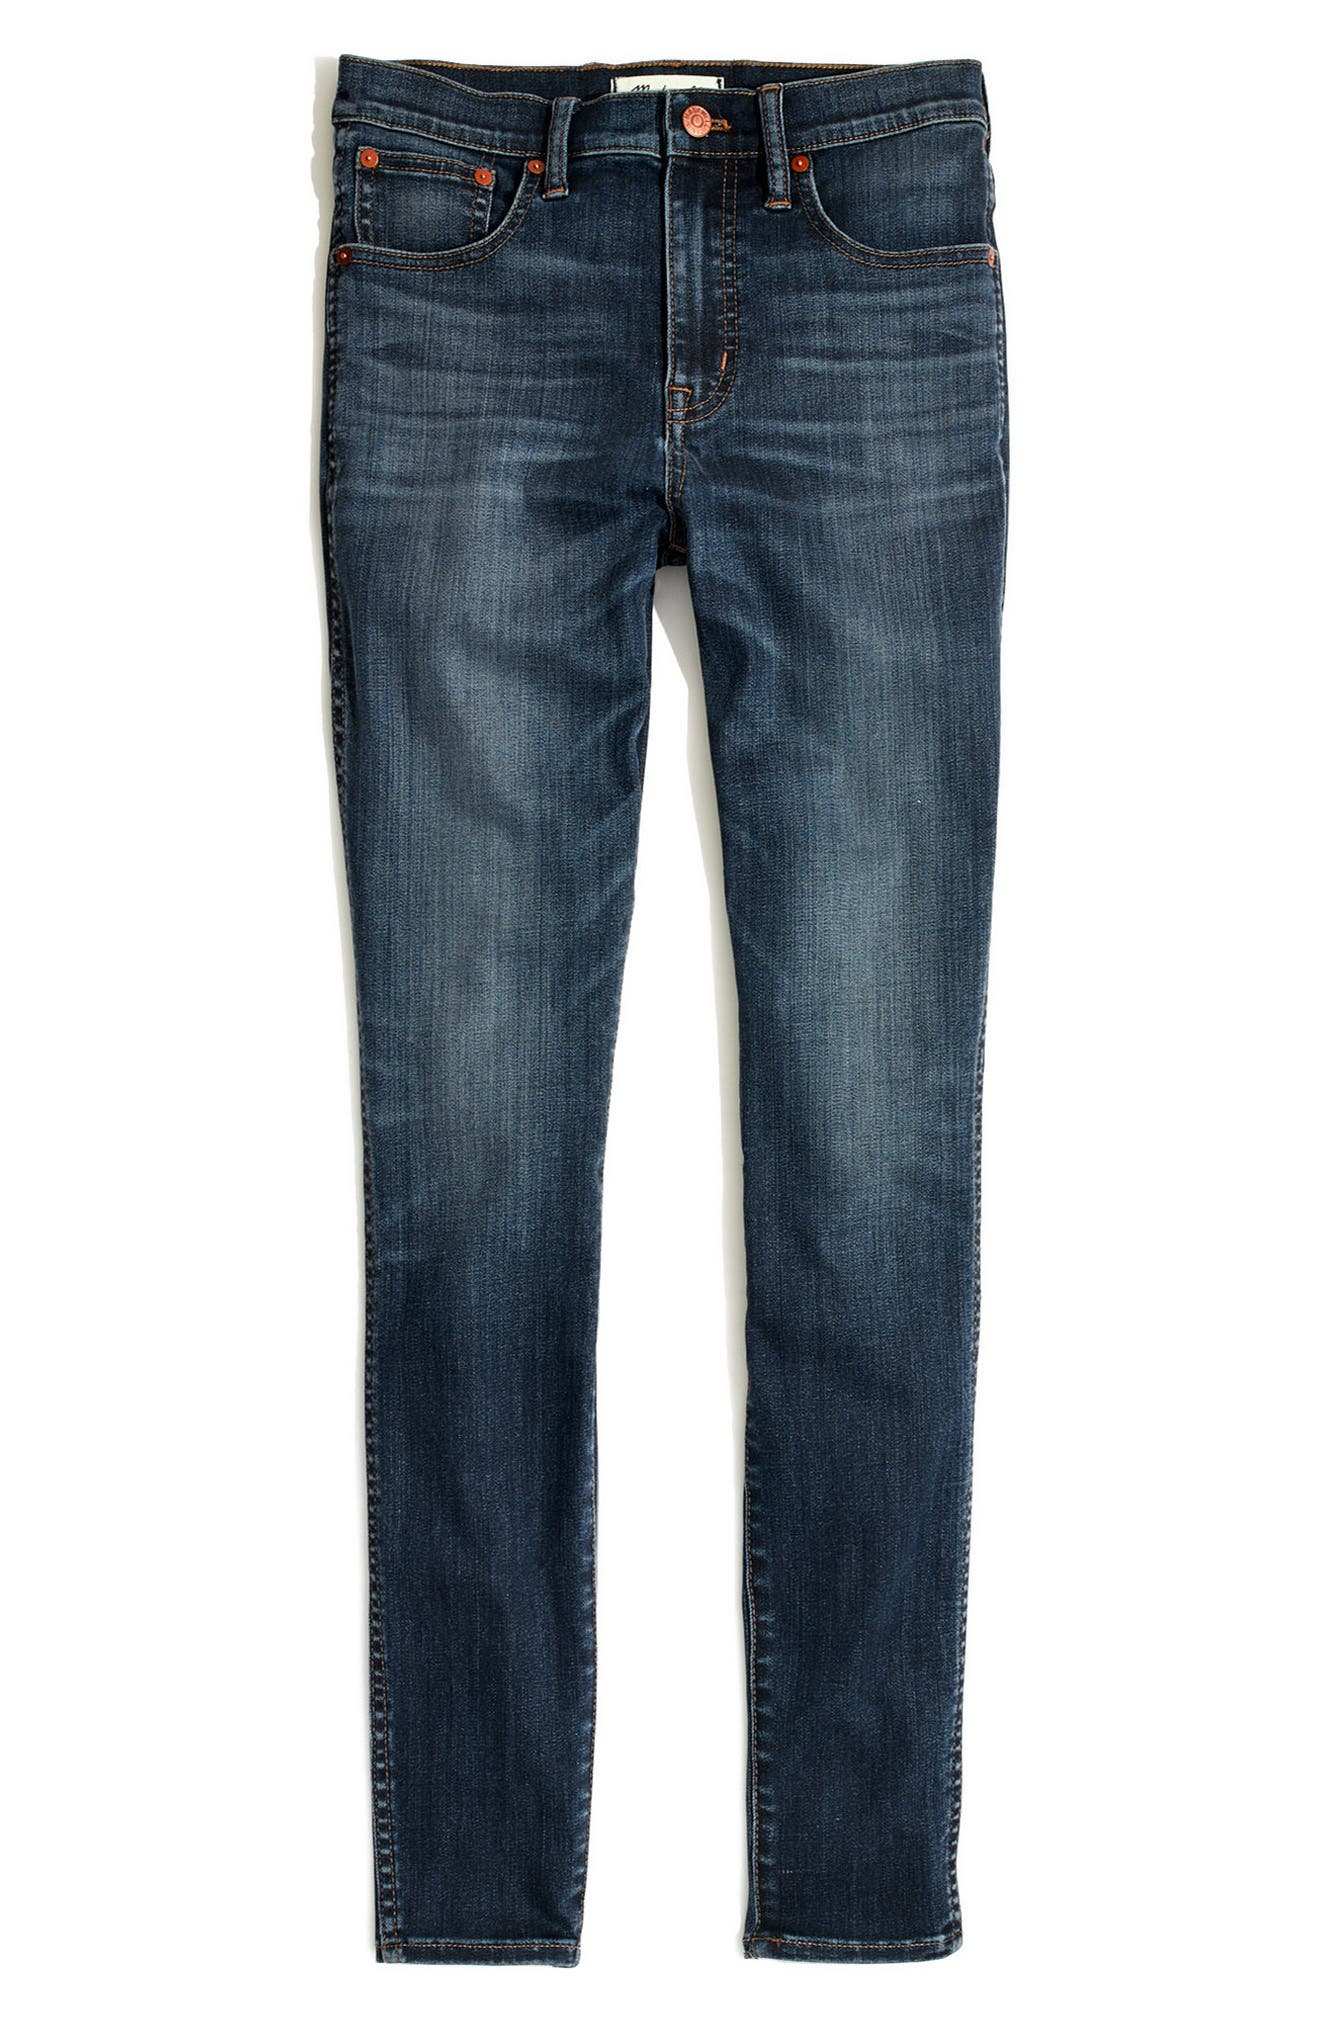 Alternate Image 4  - Madewell 10-Inch High Waist Skinny Jeans (Danny)(Petite)